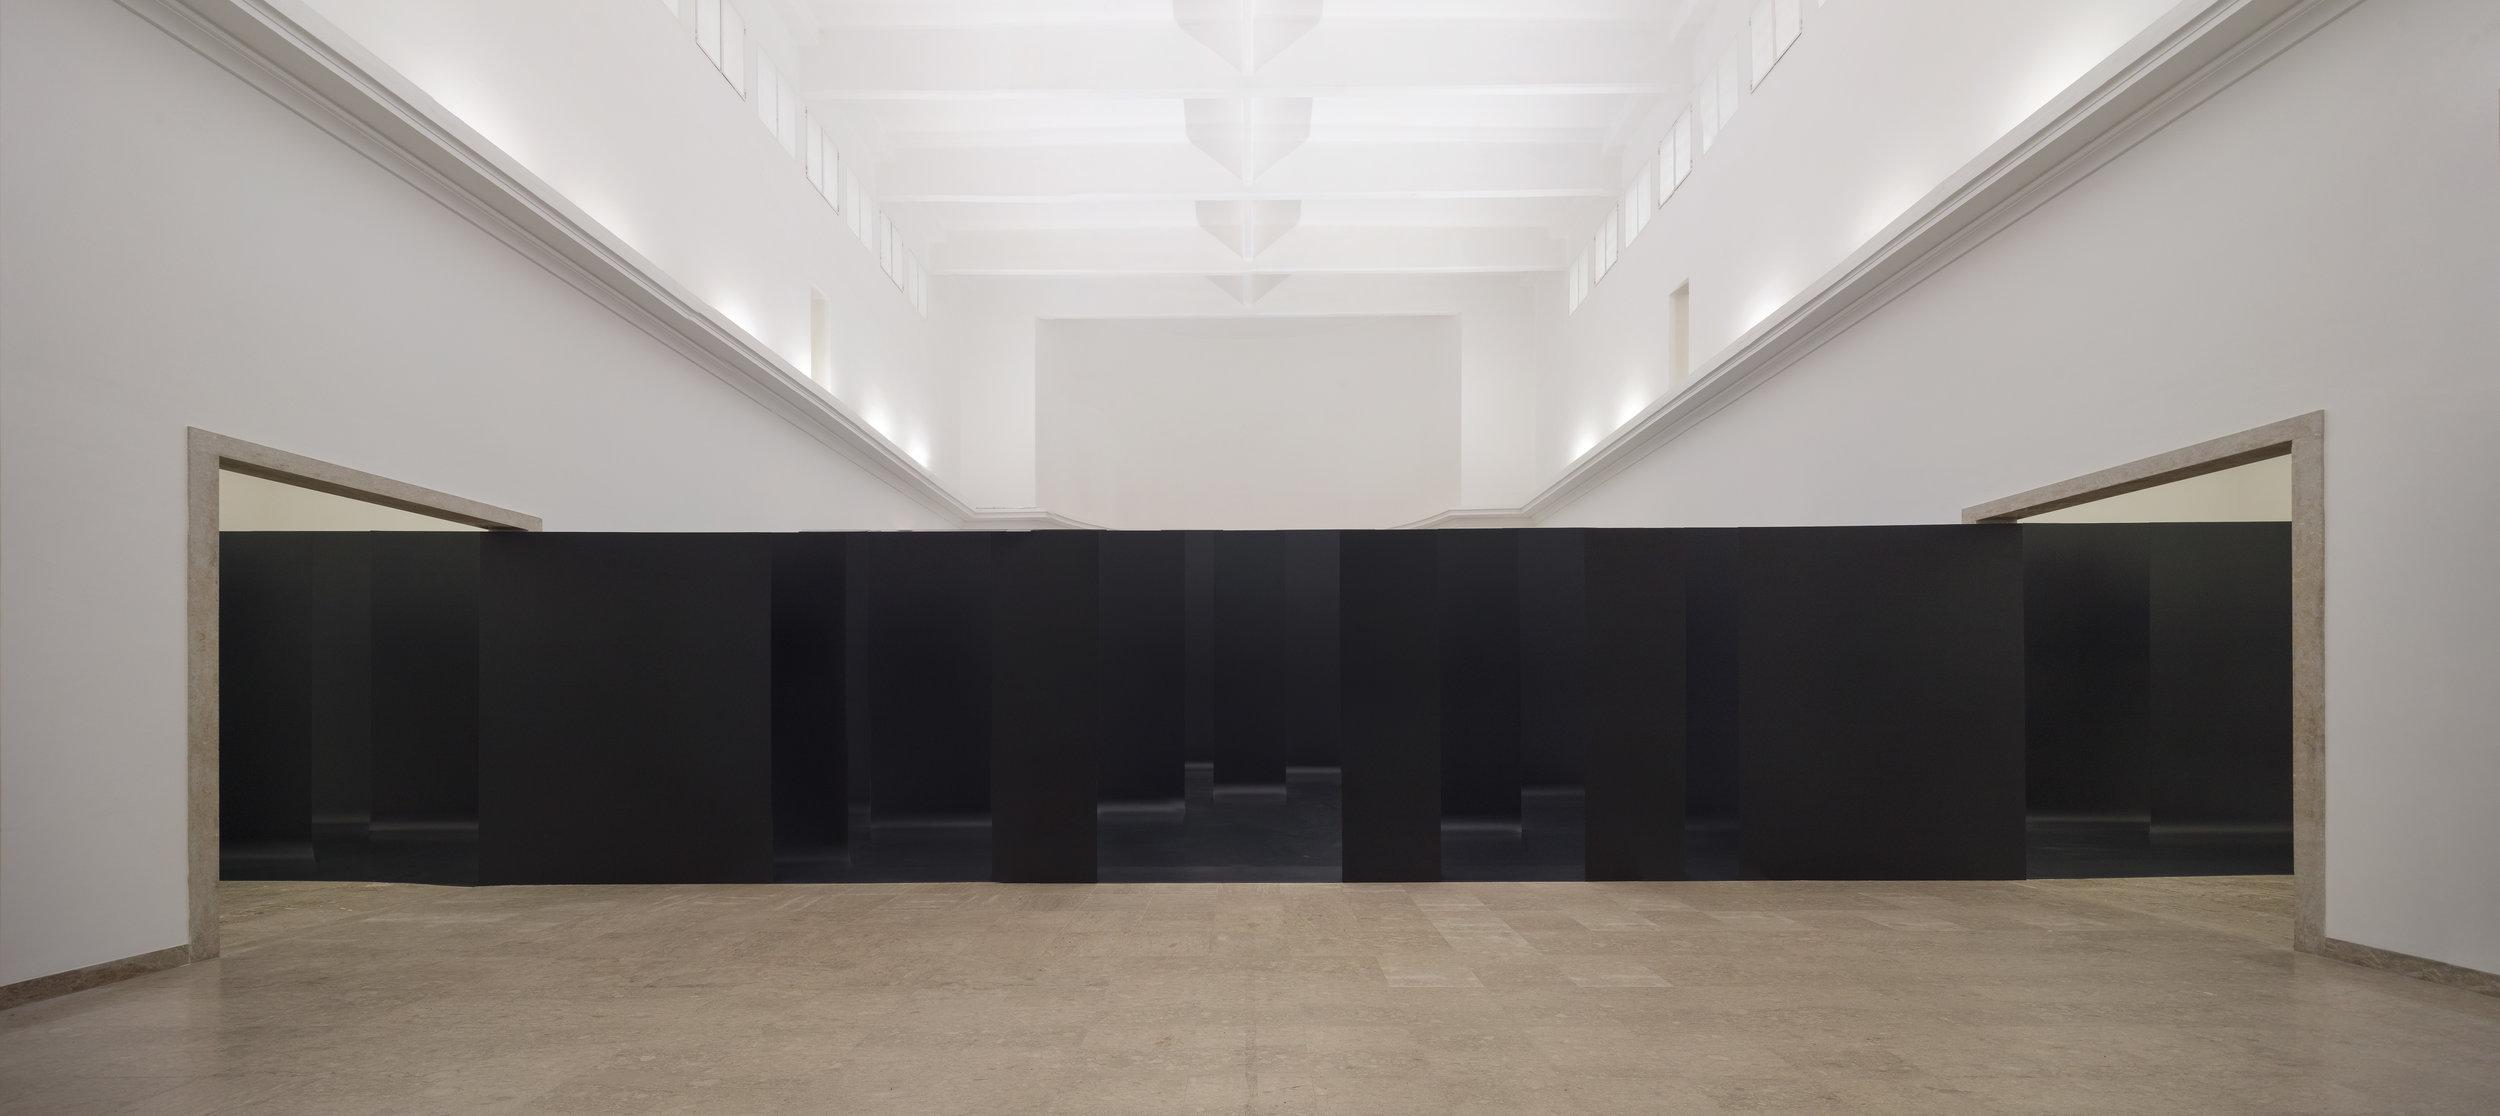 07_German Pavilion_Biennale Architettura 2018_c_Jan Bitter.jpg